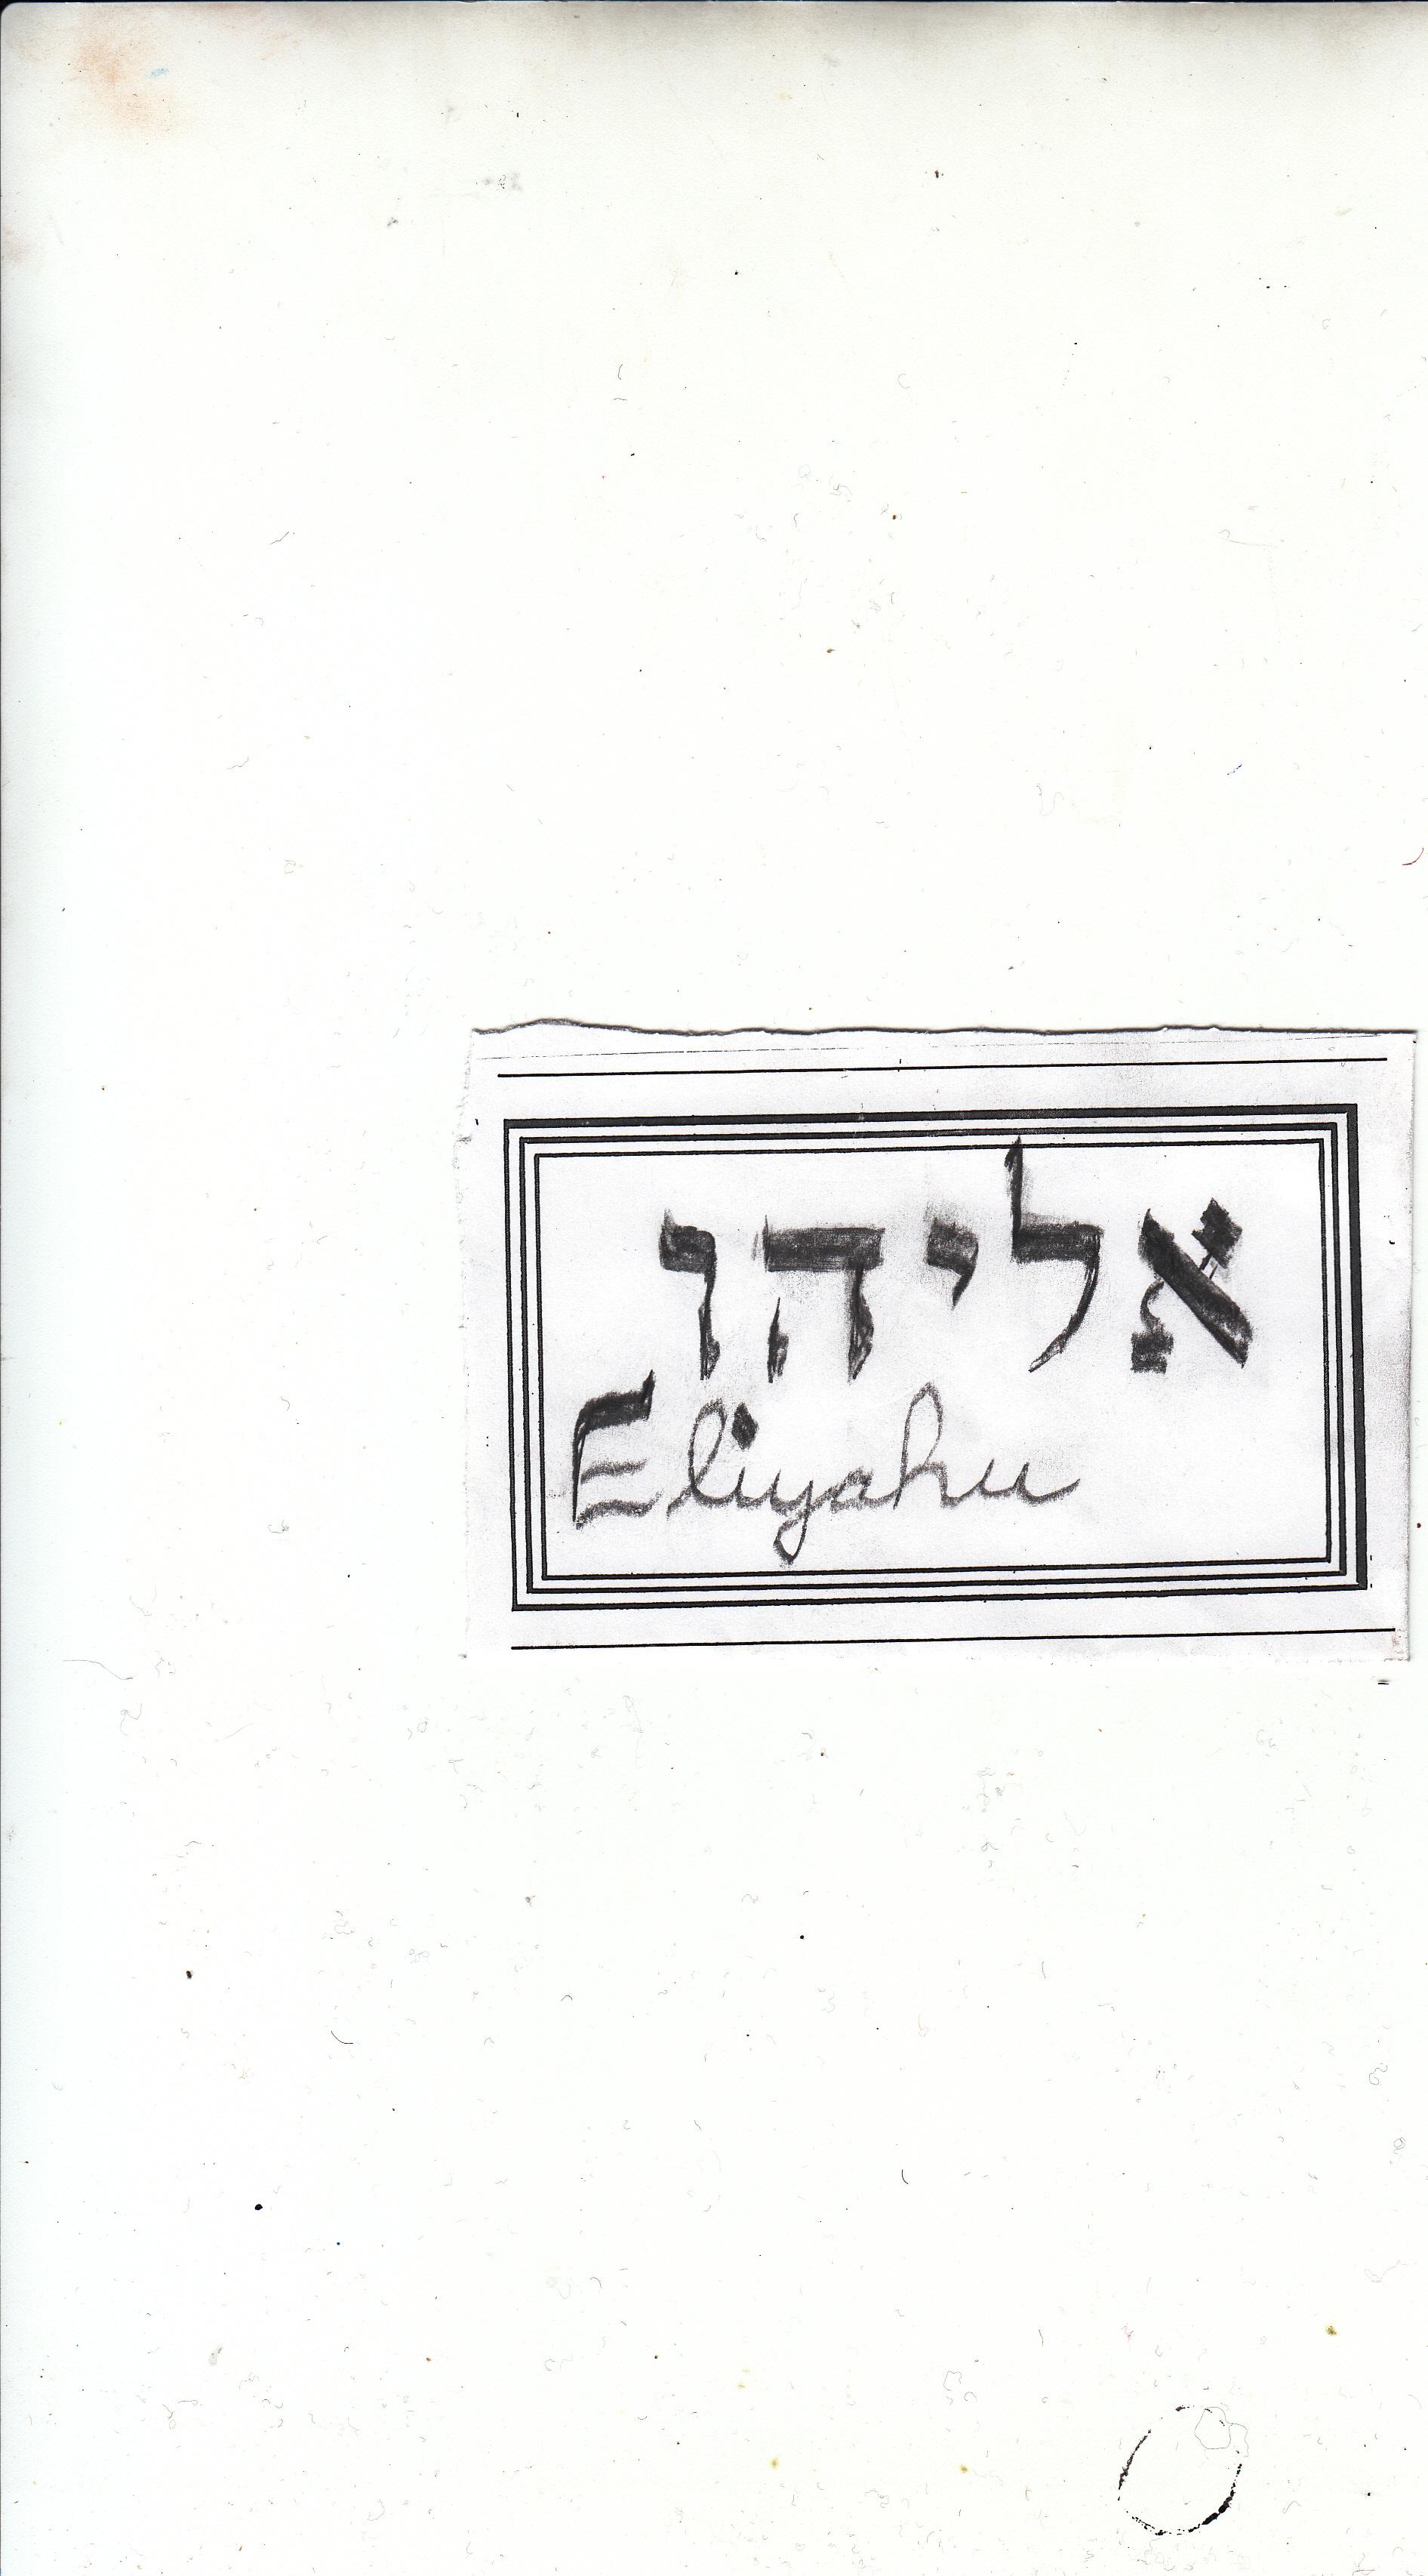 H. Ragin, Jr., a.k.a. Eliyahu  Y. O. Ben-yisra'el Signature